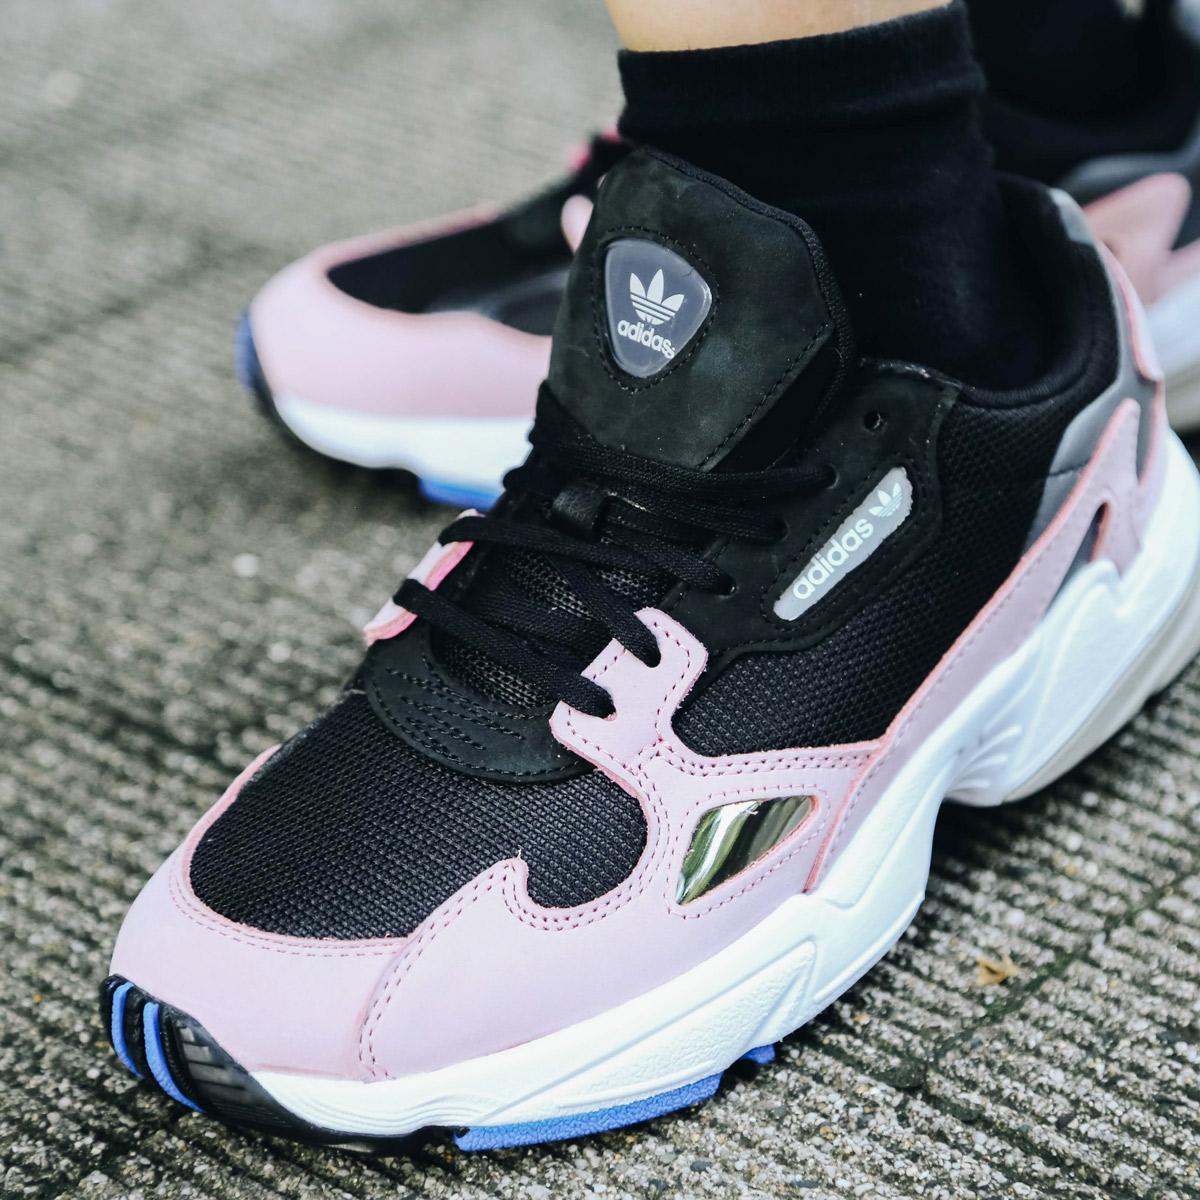 adidas FALCON W (Adidas falcon W) core black / core black / light pink  18FW-I